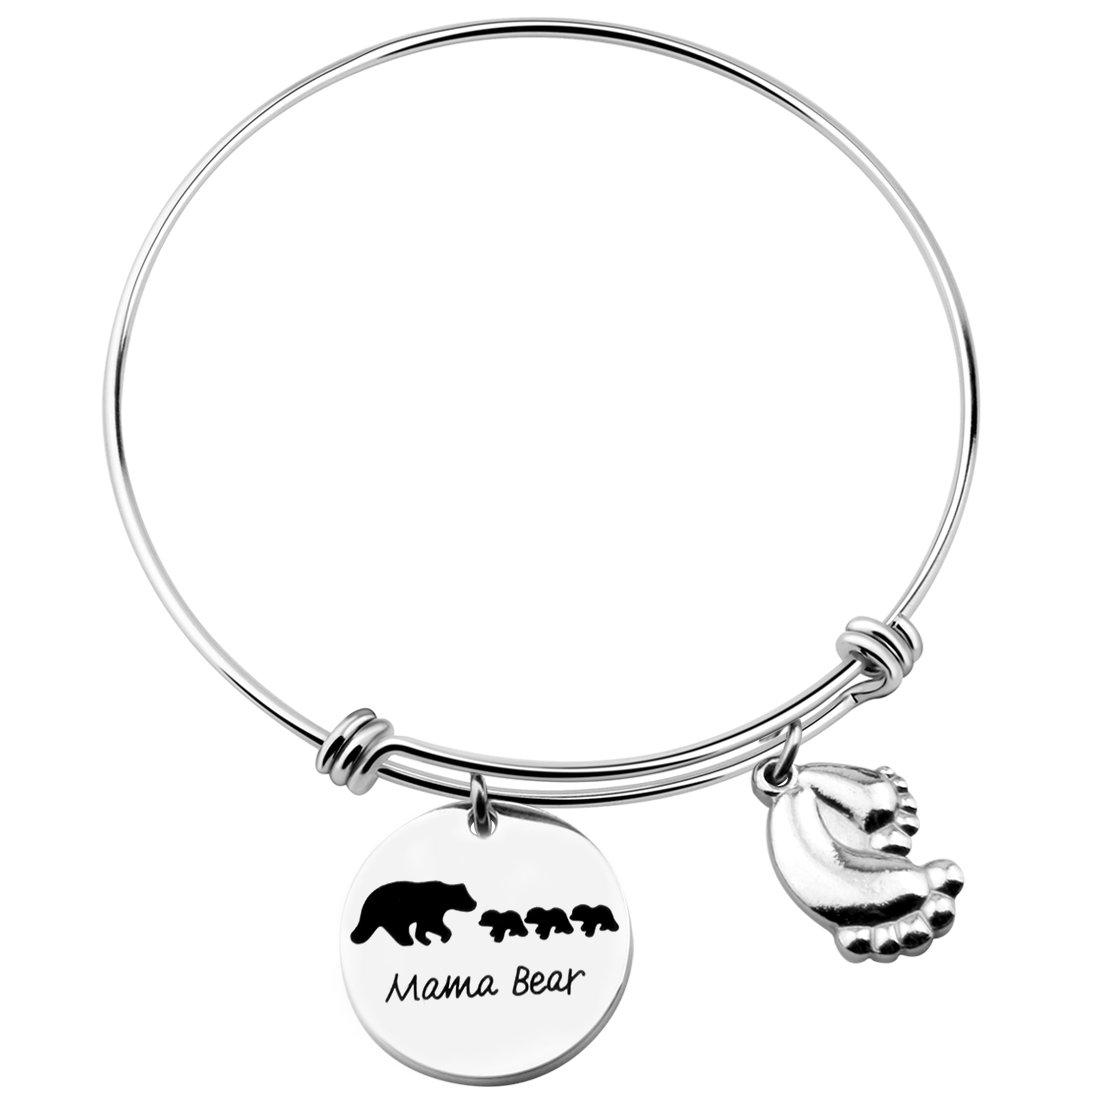 MAOFAED Personalized Mama Bear Bracelet, Mama Bear Jewelry, Wife Gift Jewelry